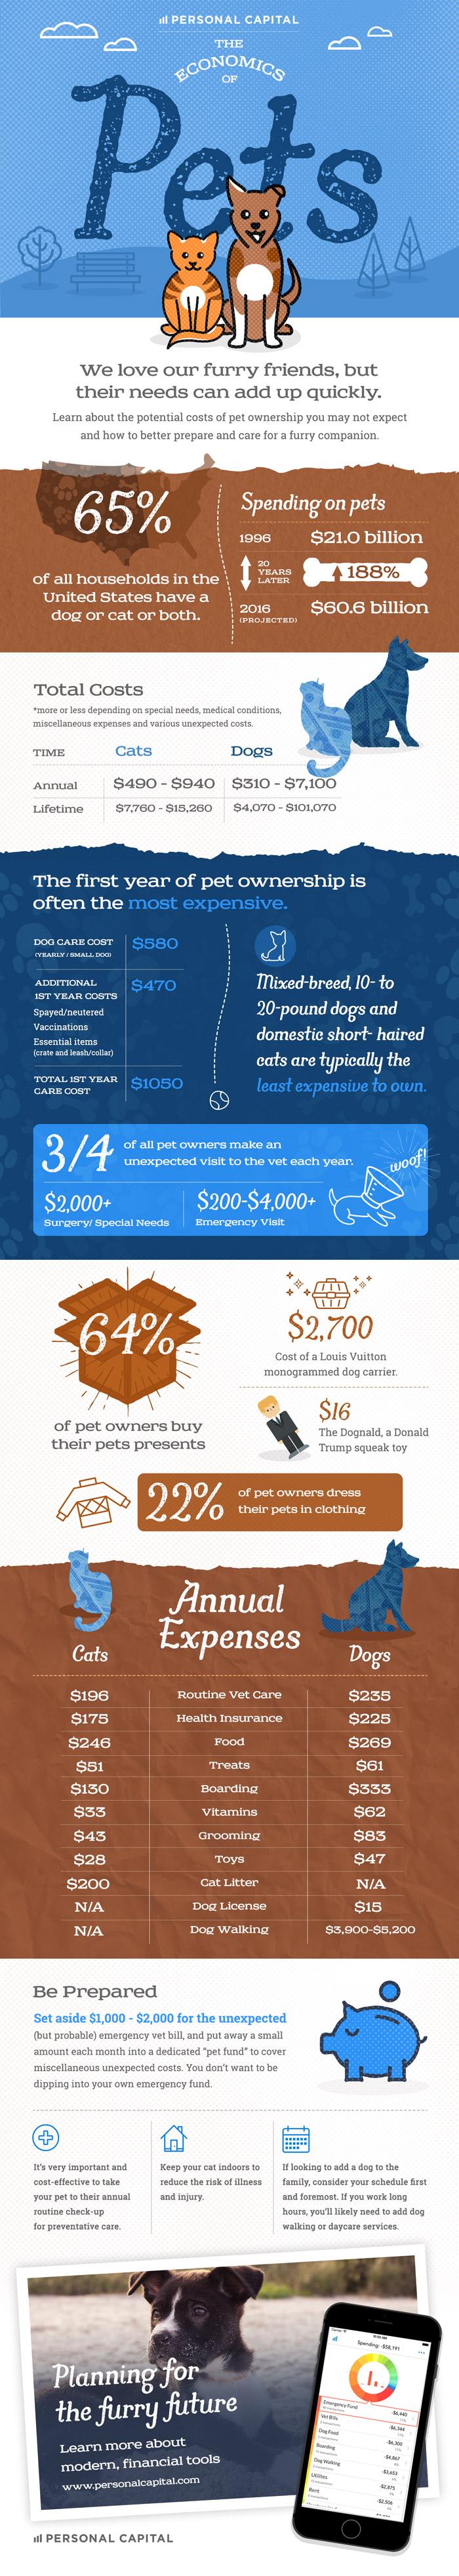 Economics of Pets